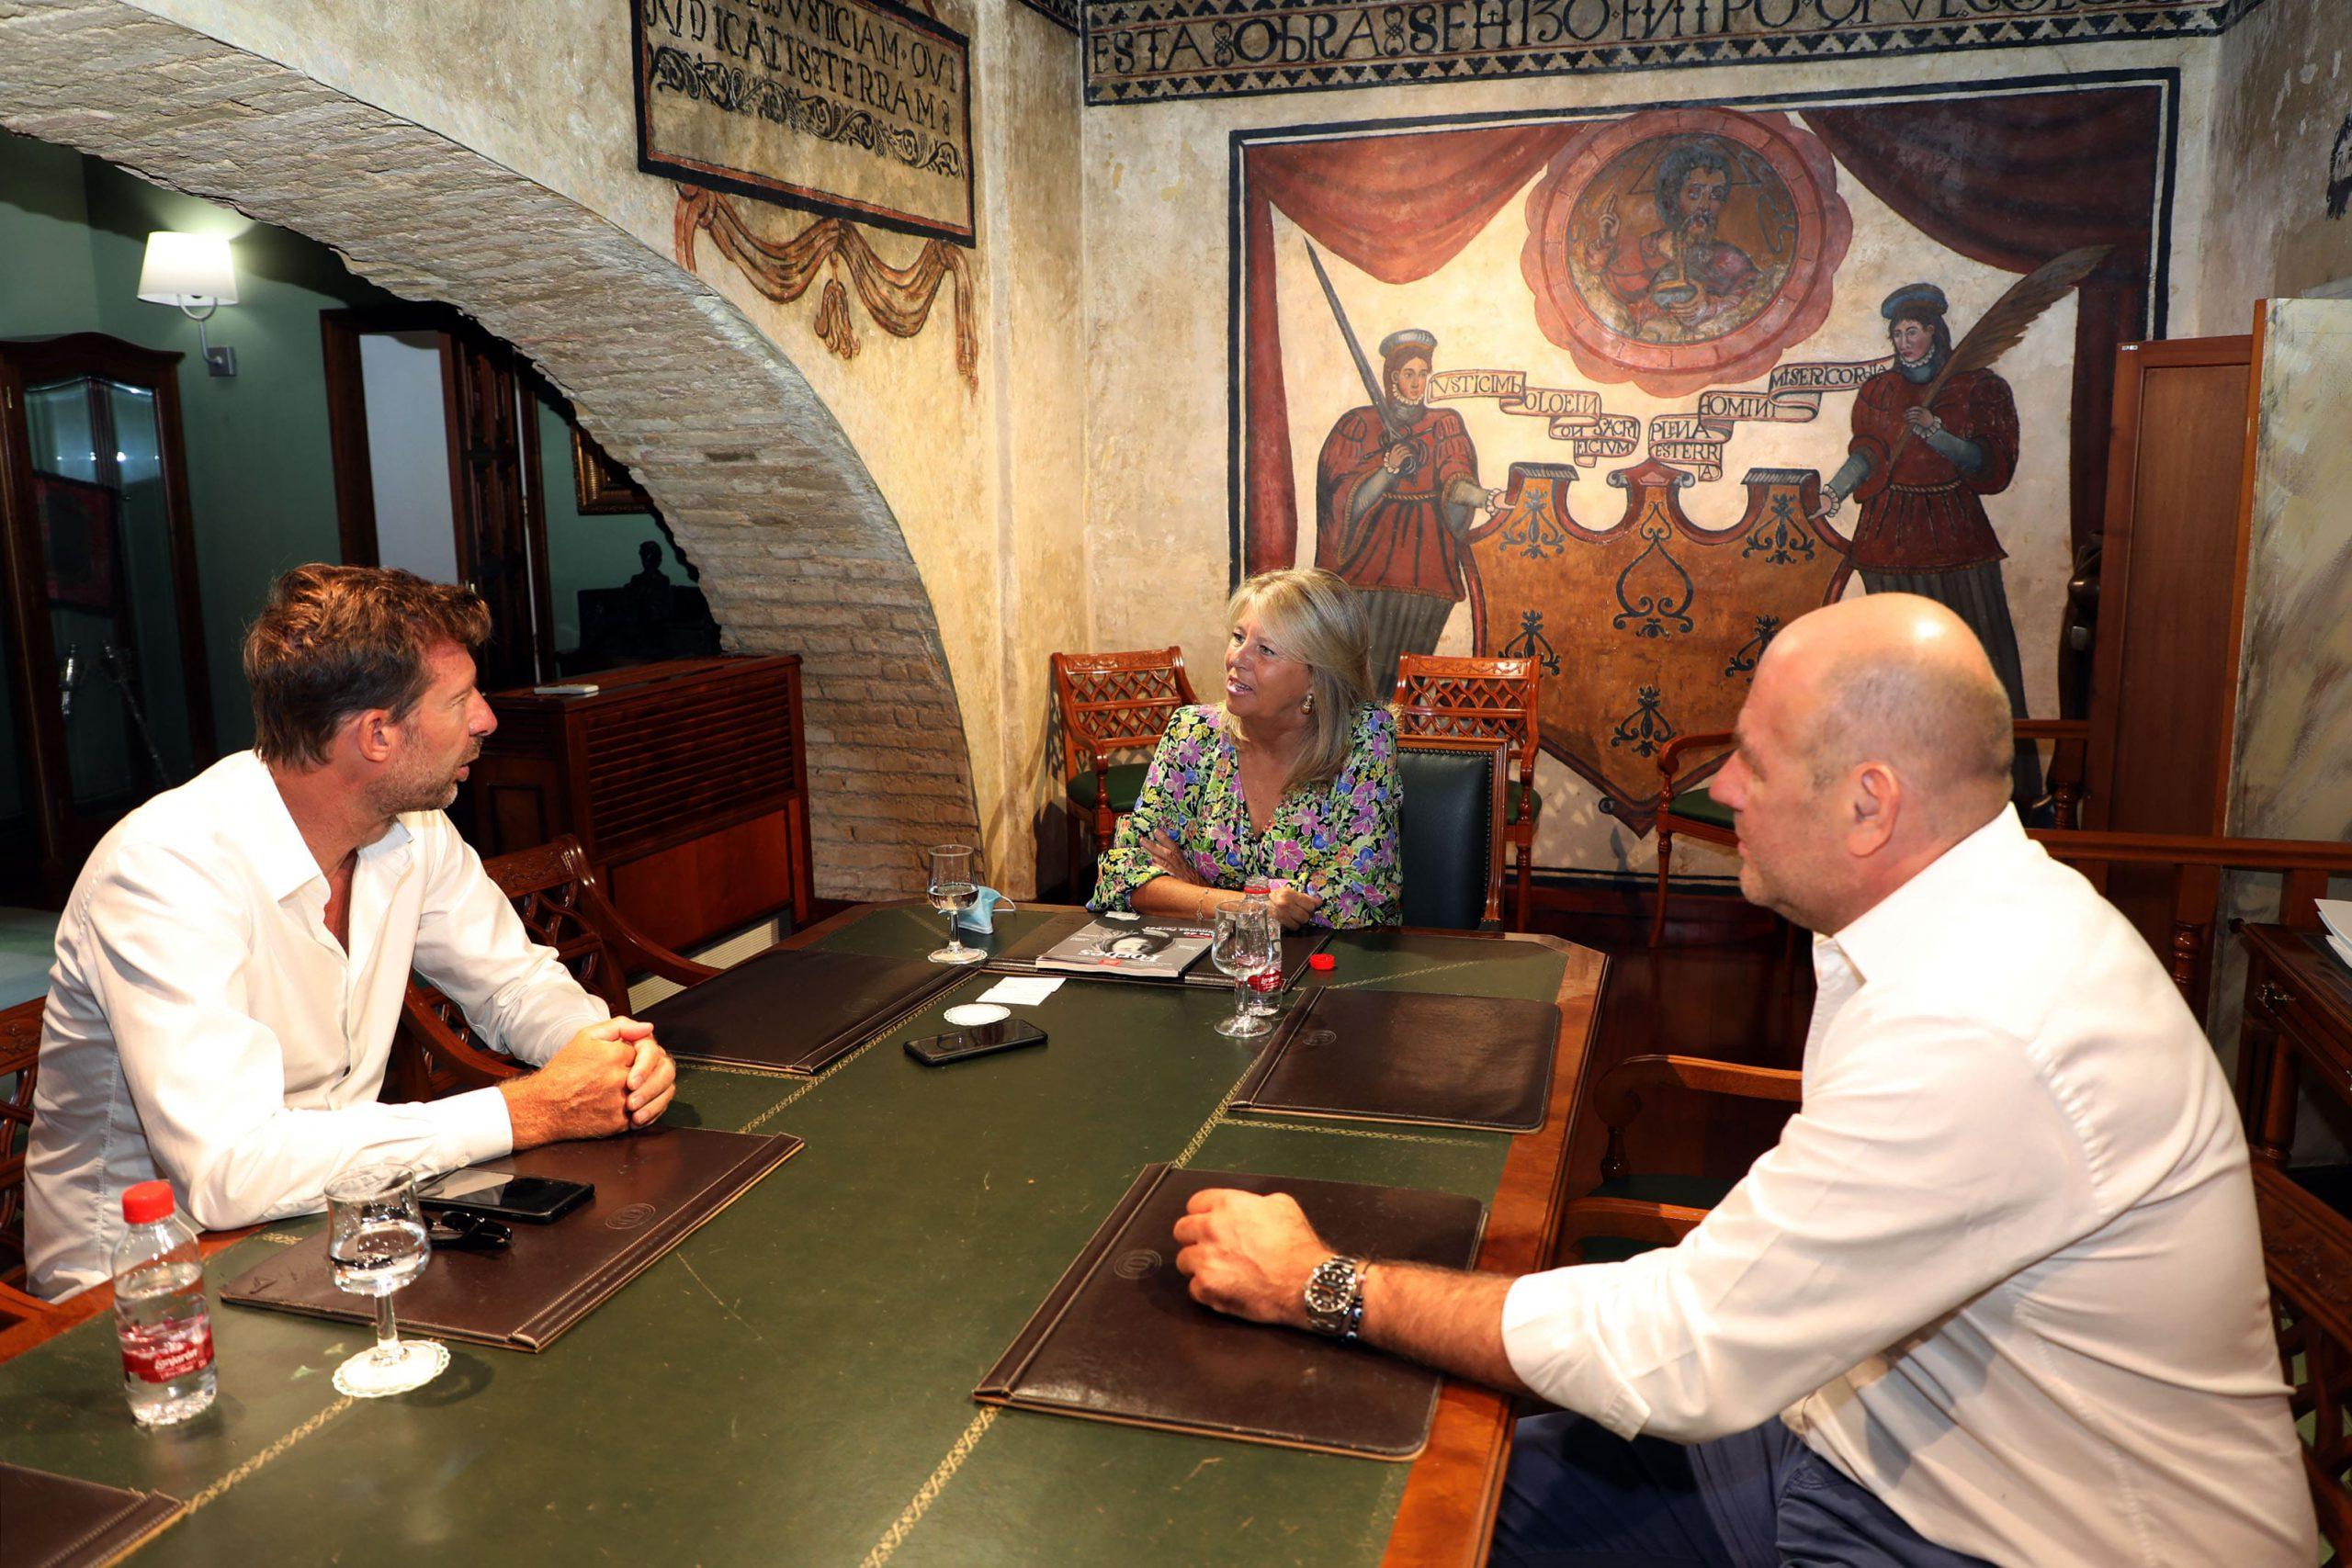 La alcaldesa recibe a un equipo de la edición francesa de la revista Forbes